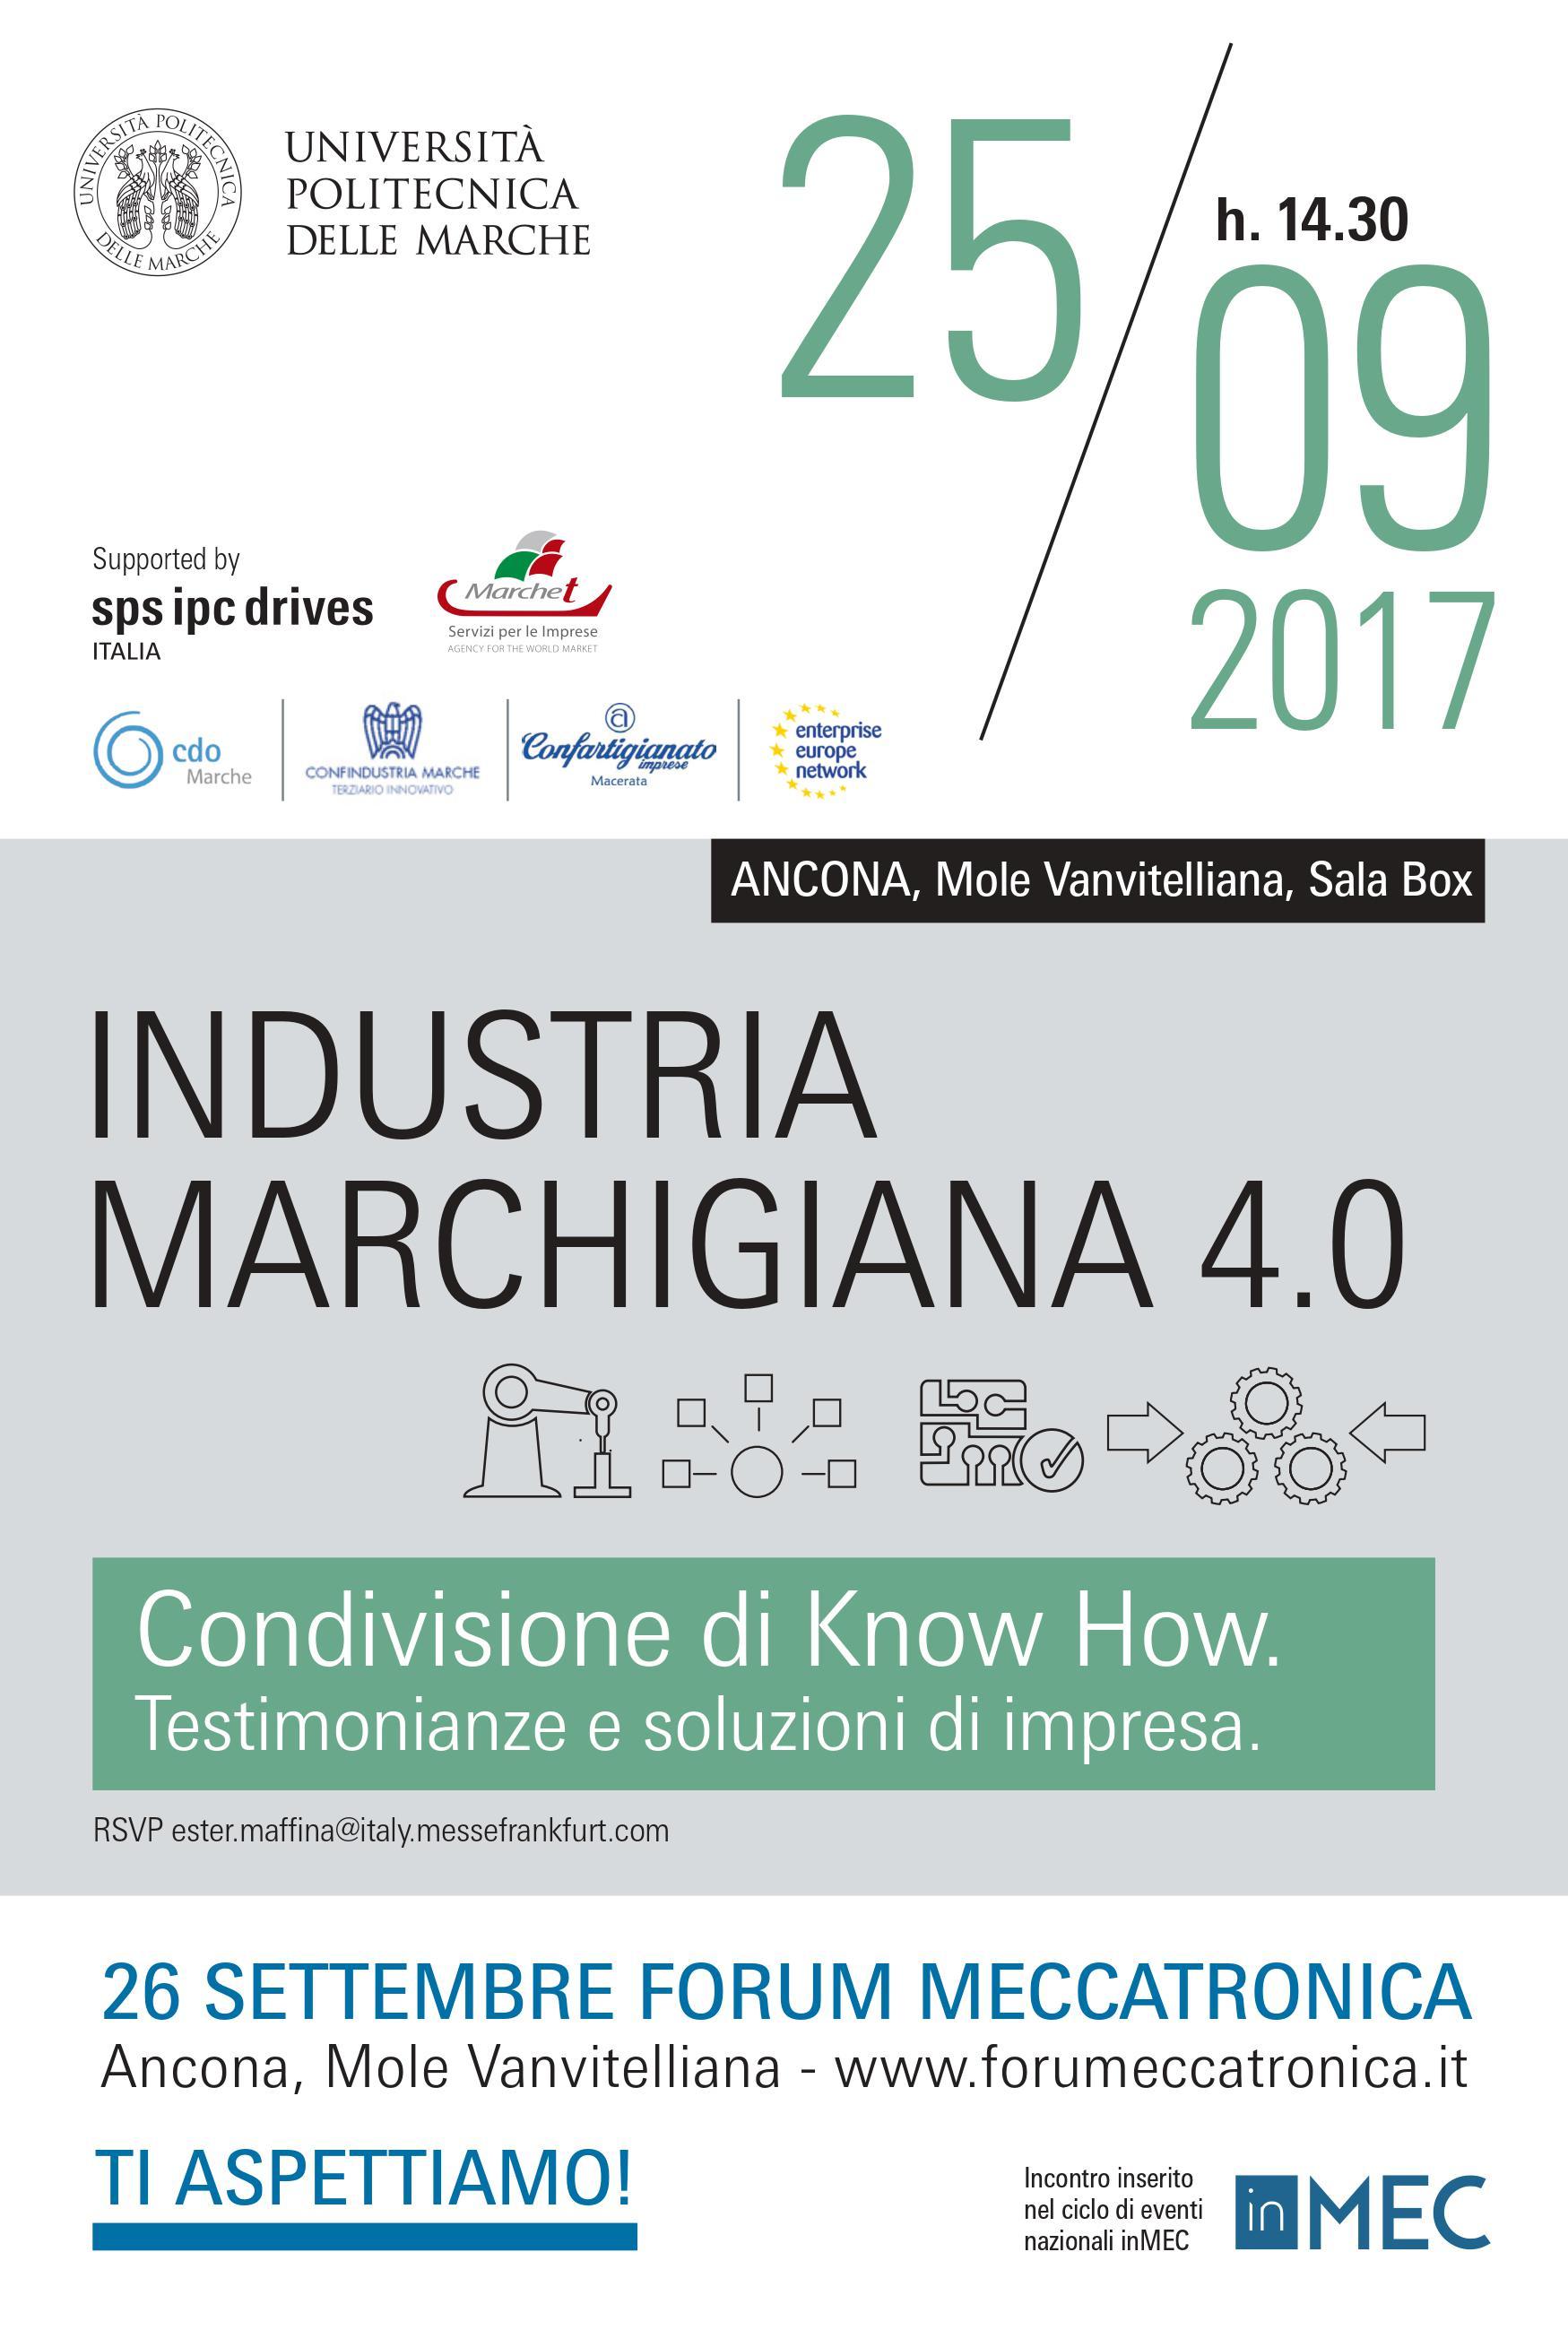 Industria Marchigiana 4.0: testimonianze di impresa